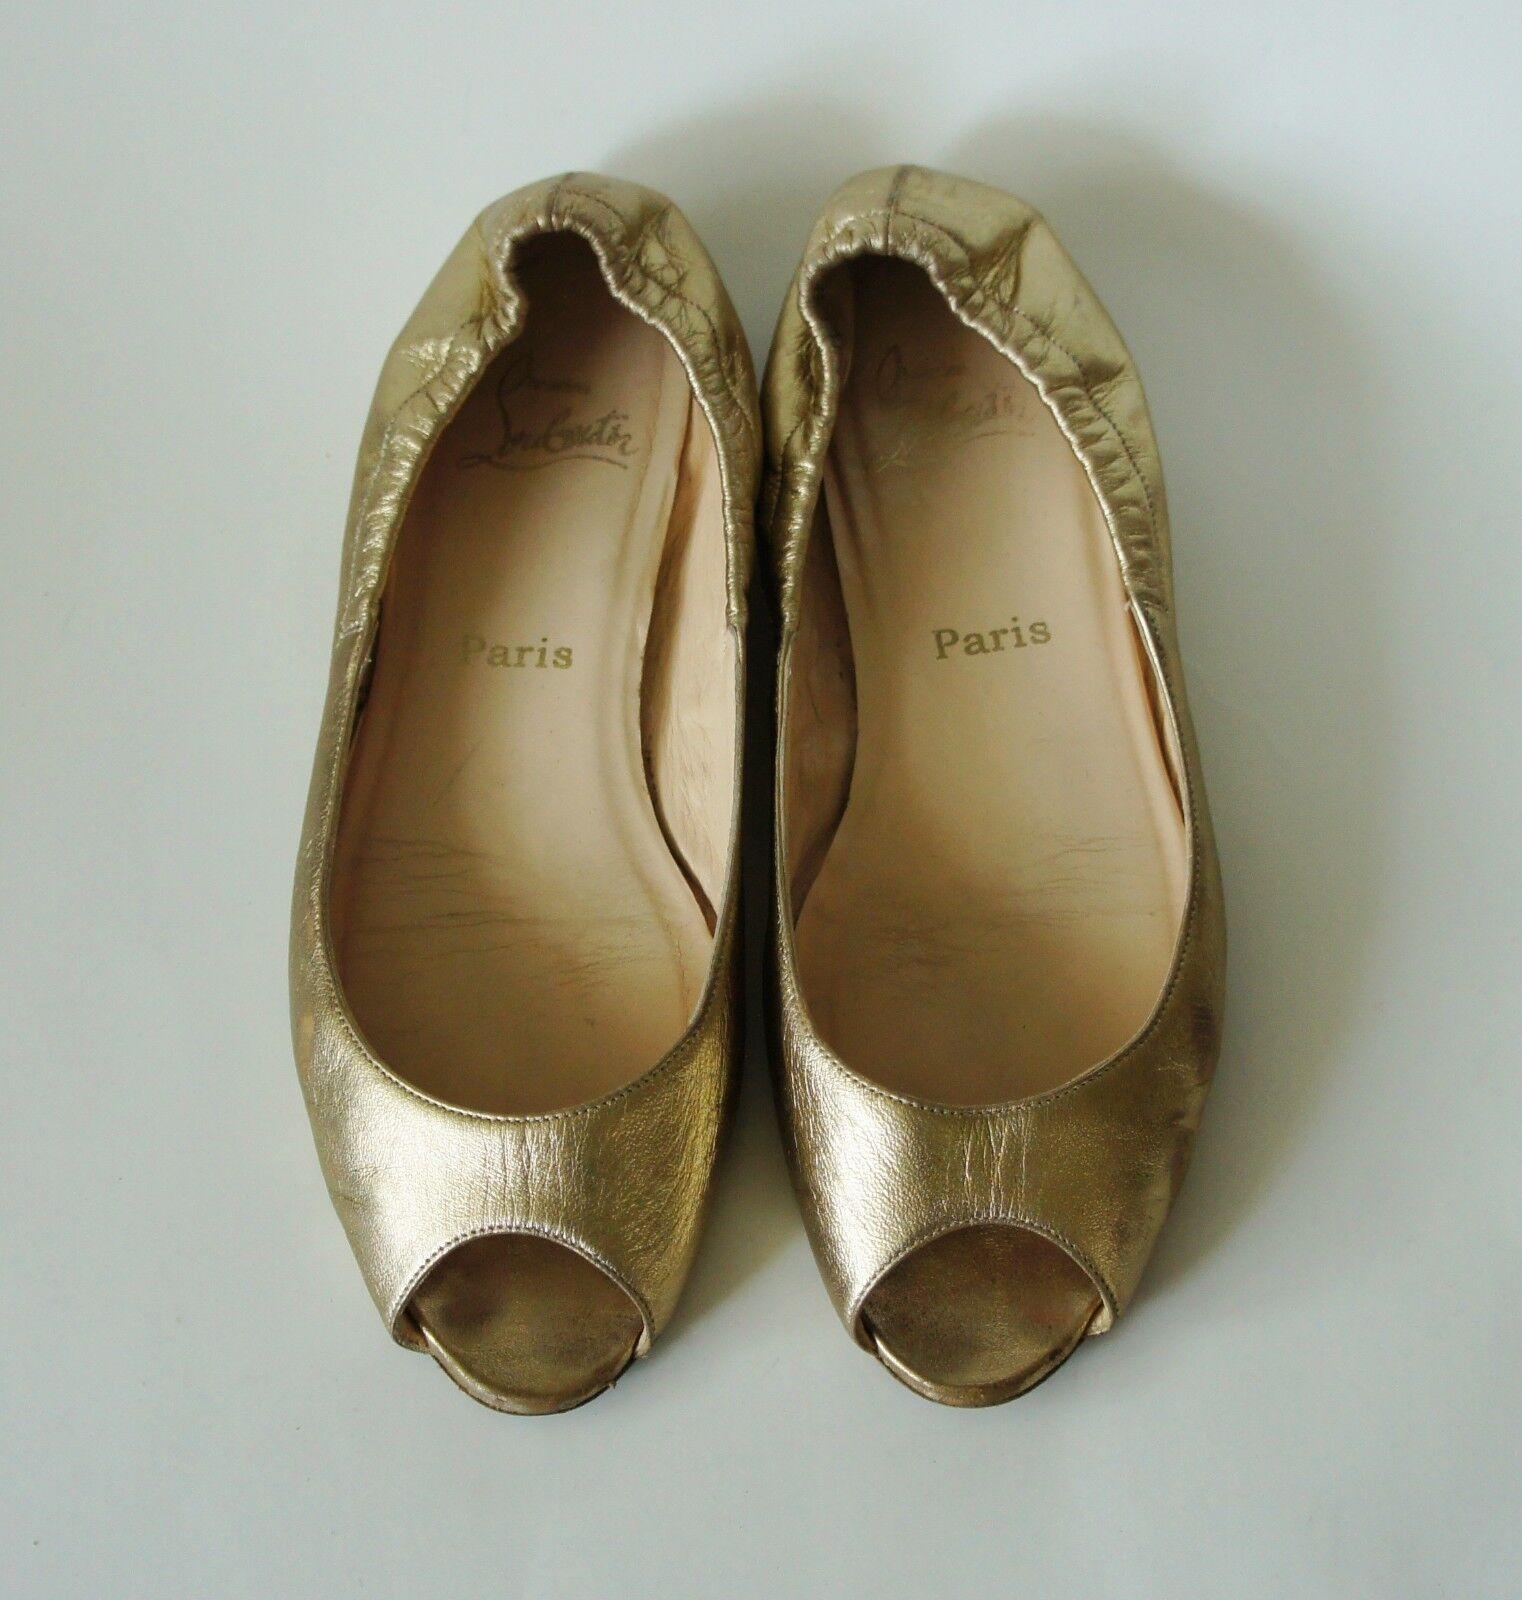 Wildleder UK4.5 Schuhe PUMPS Damen München PG Grün PAUL